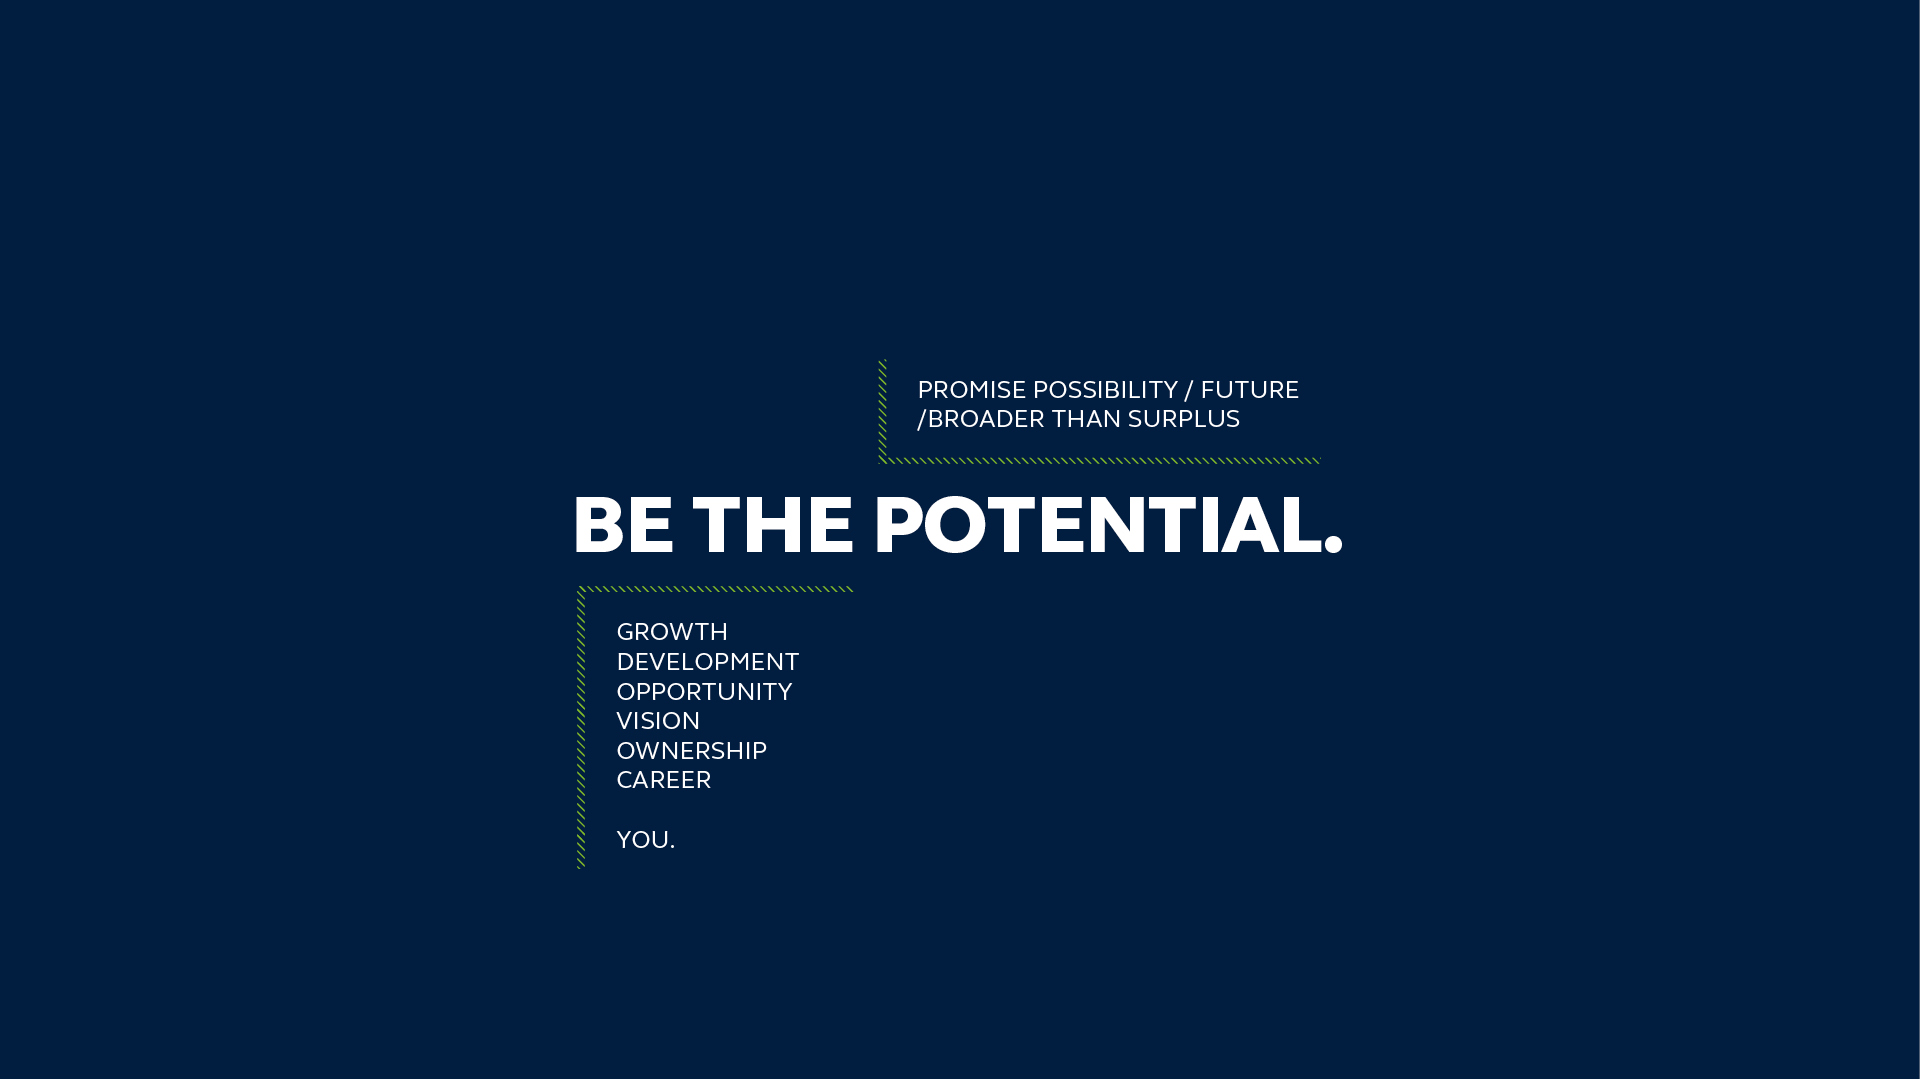 CSG Internal Brand